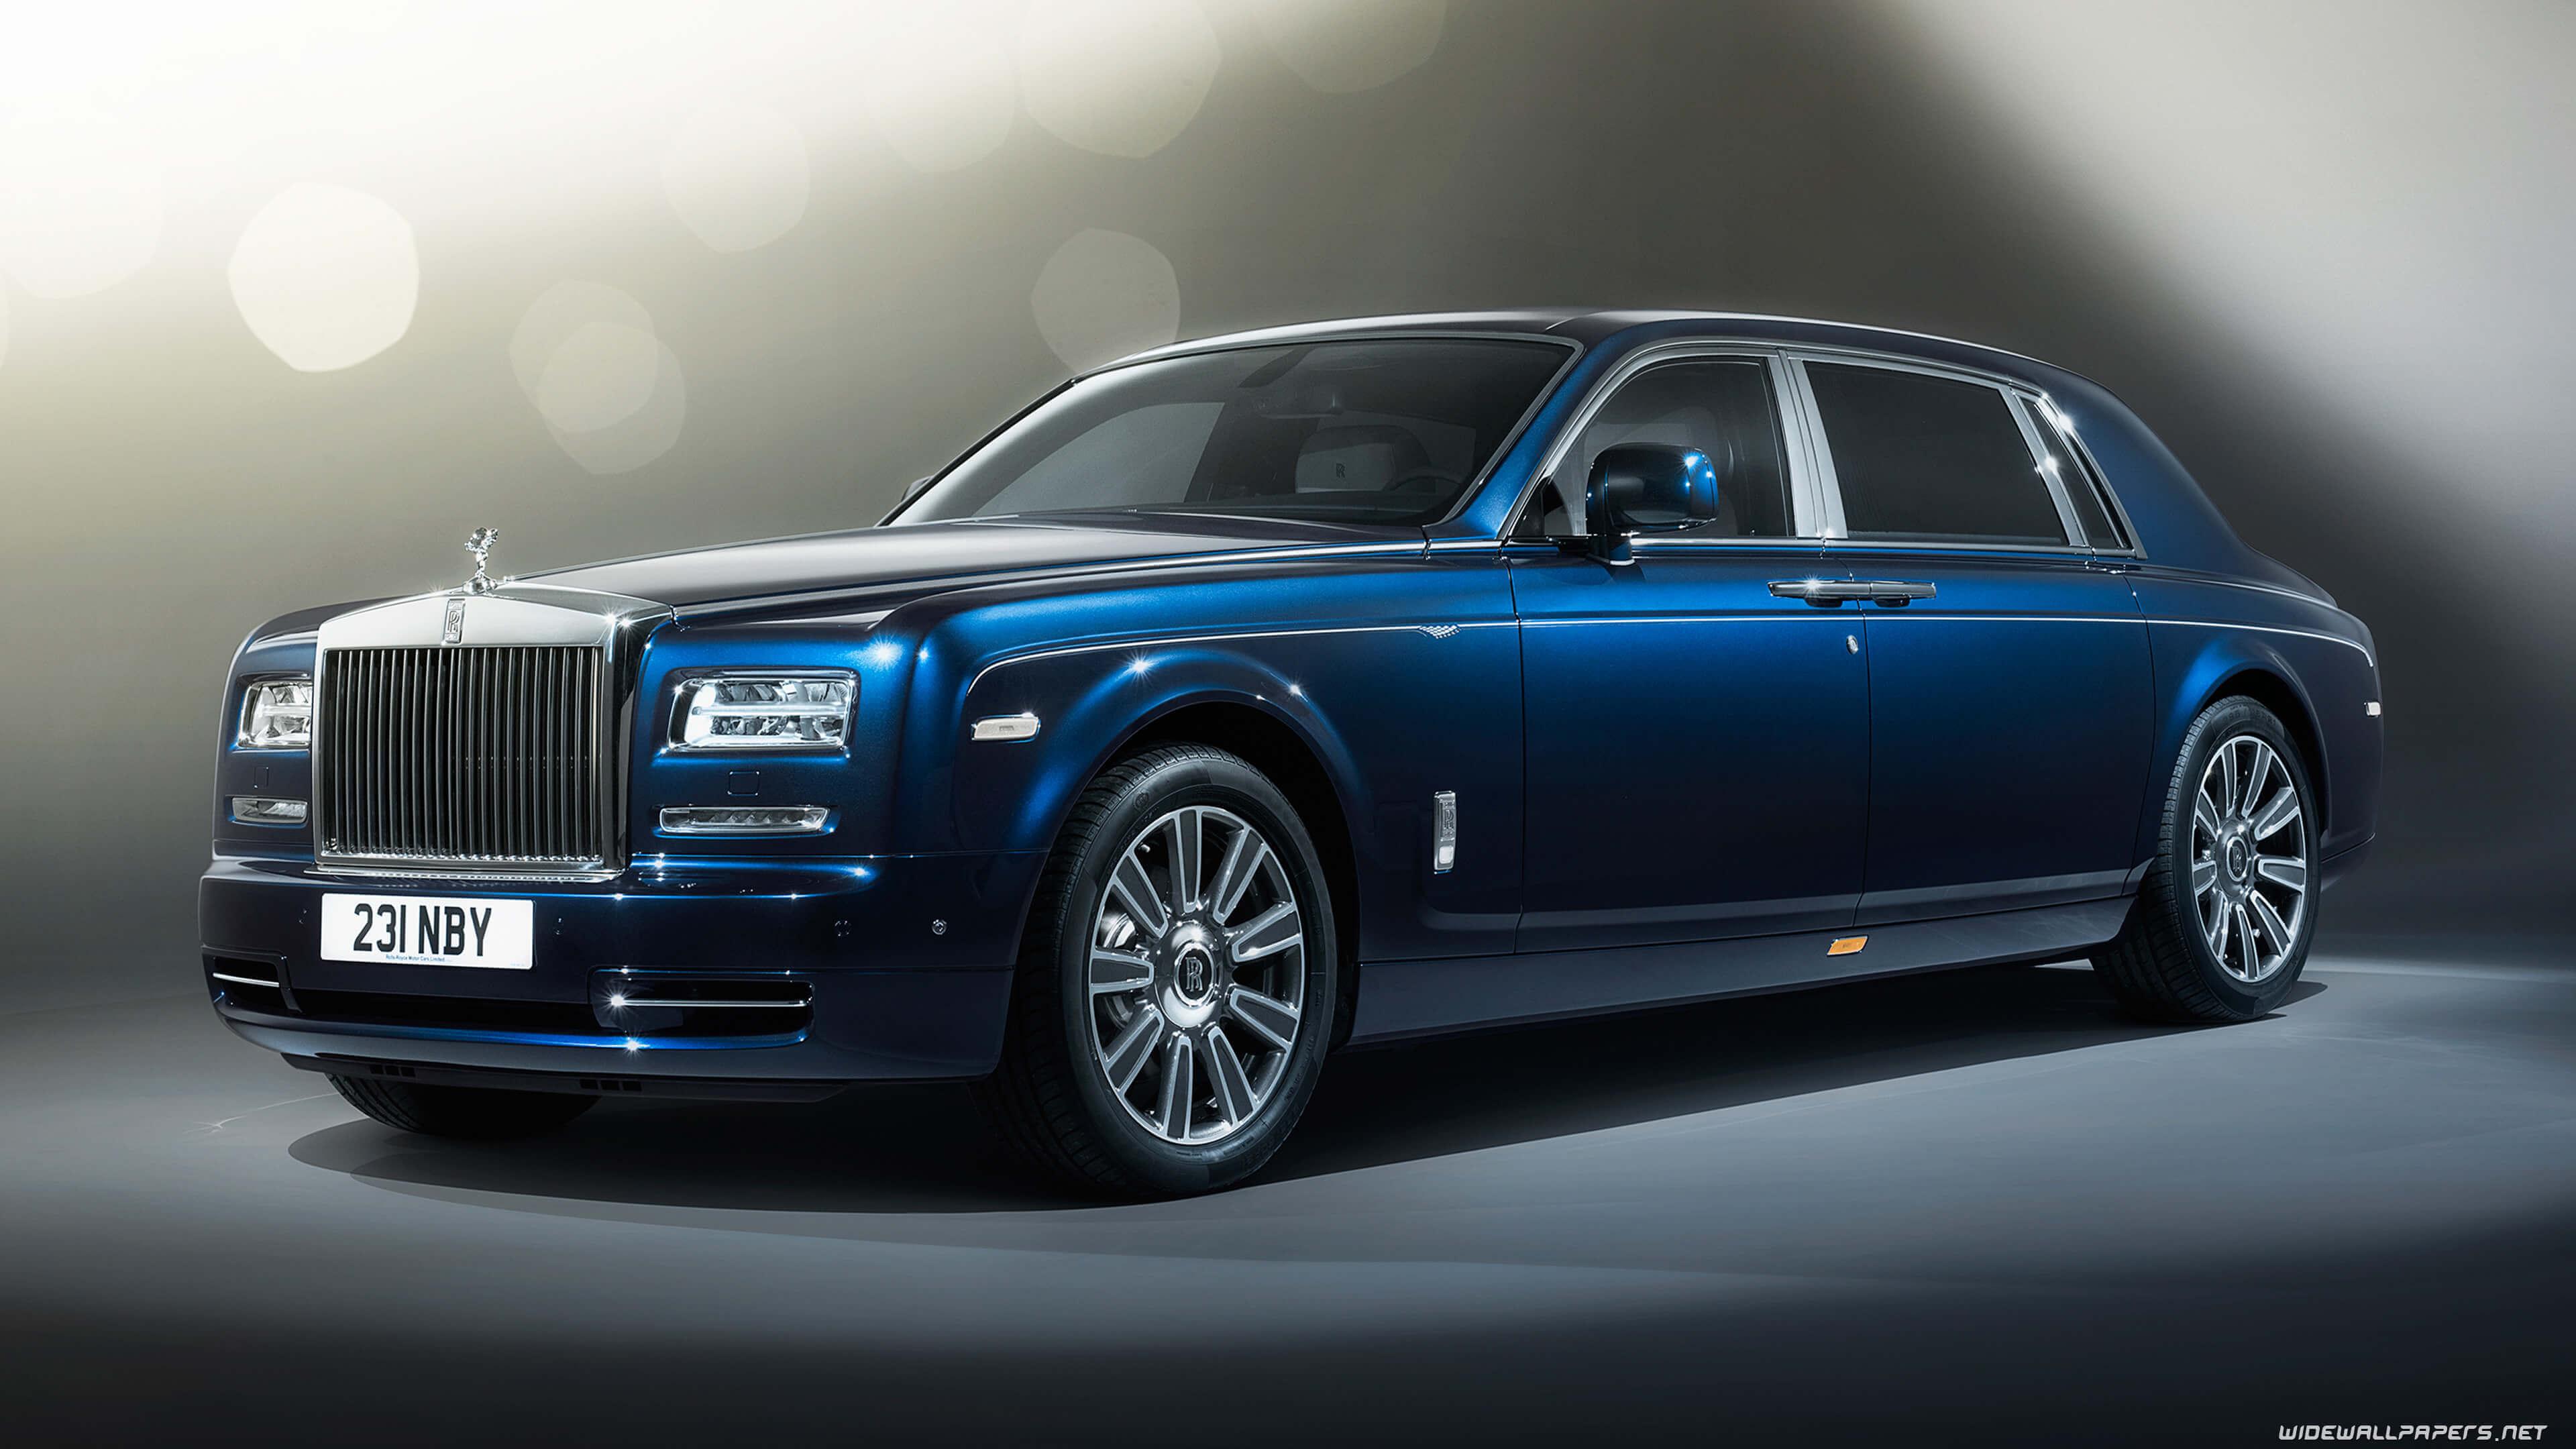 Rolls Royce Phantom Wallpapers Wallpaper Cave